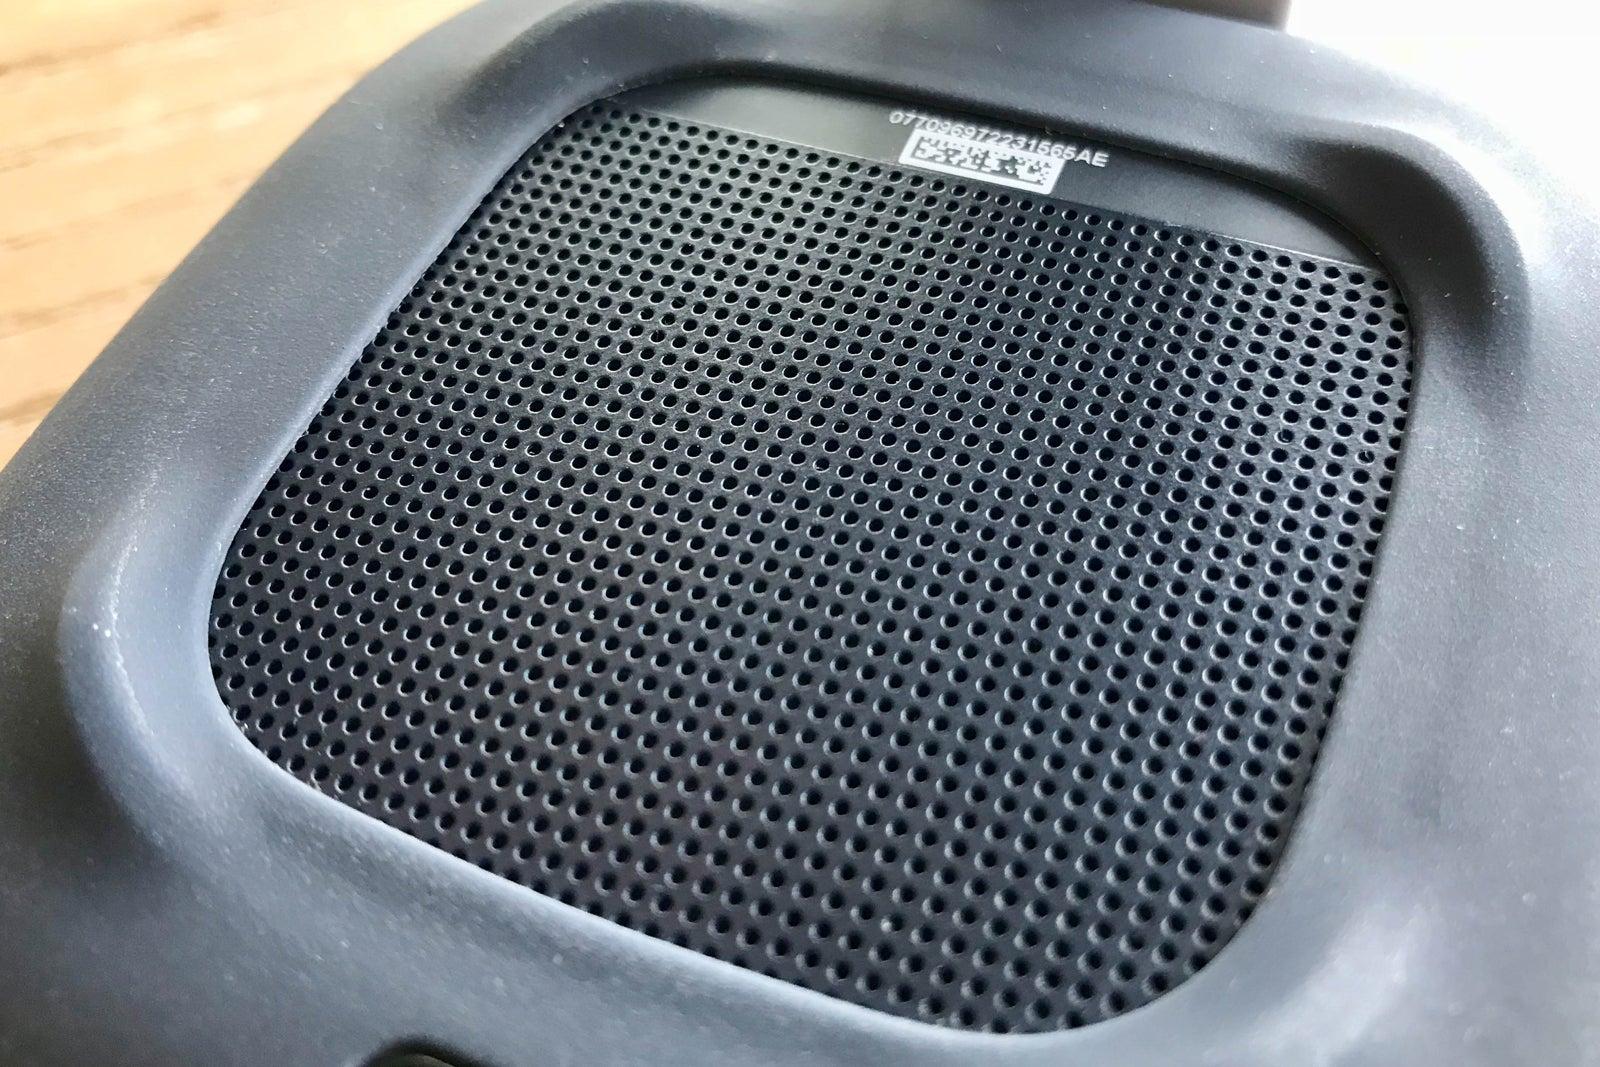 Bose Stereo >> Bose Soundlink Micro review | TechHive